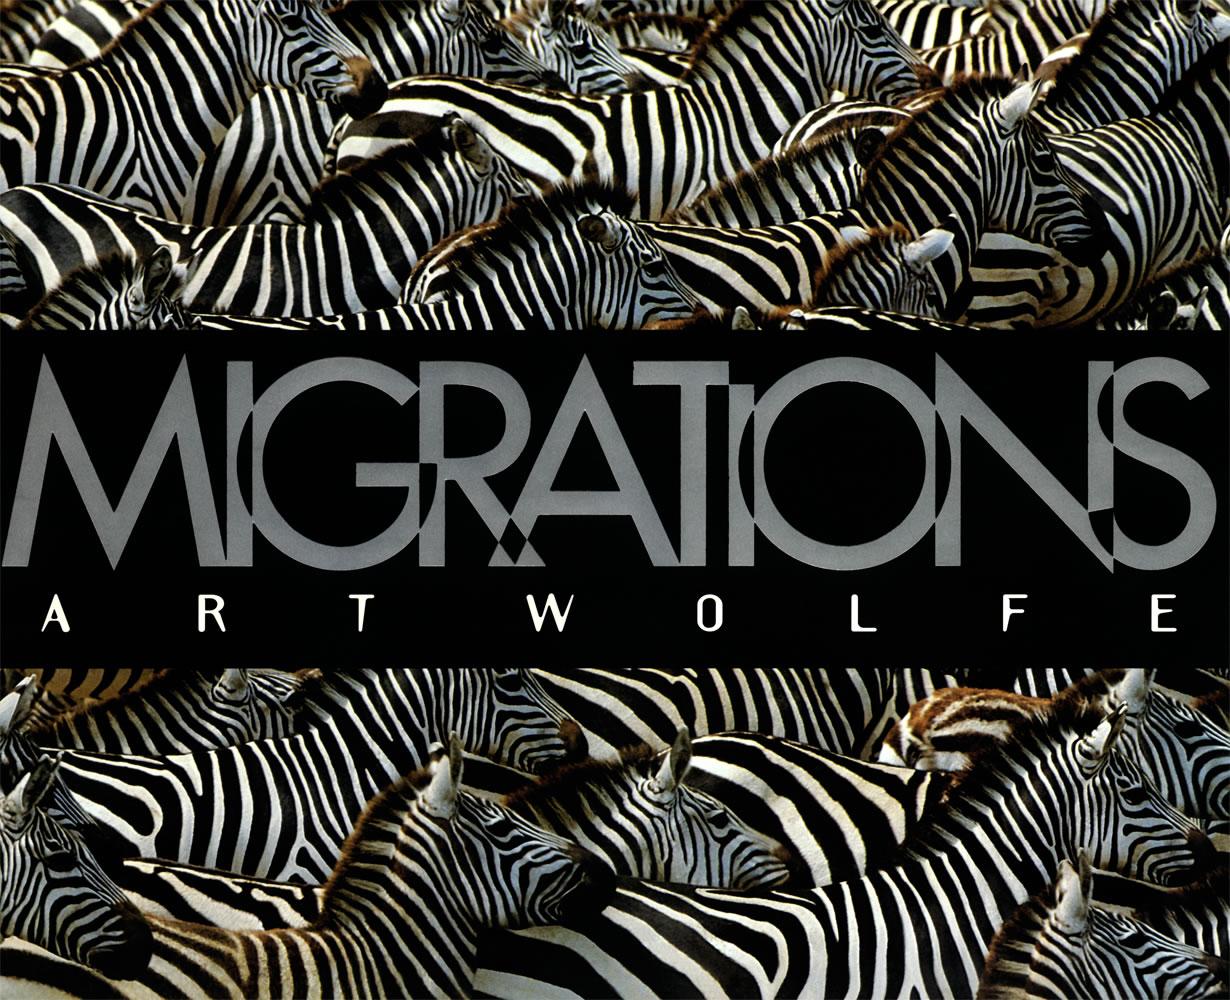 Art Wolfe Migrations: Wildlife In Motion Smithsonian